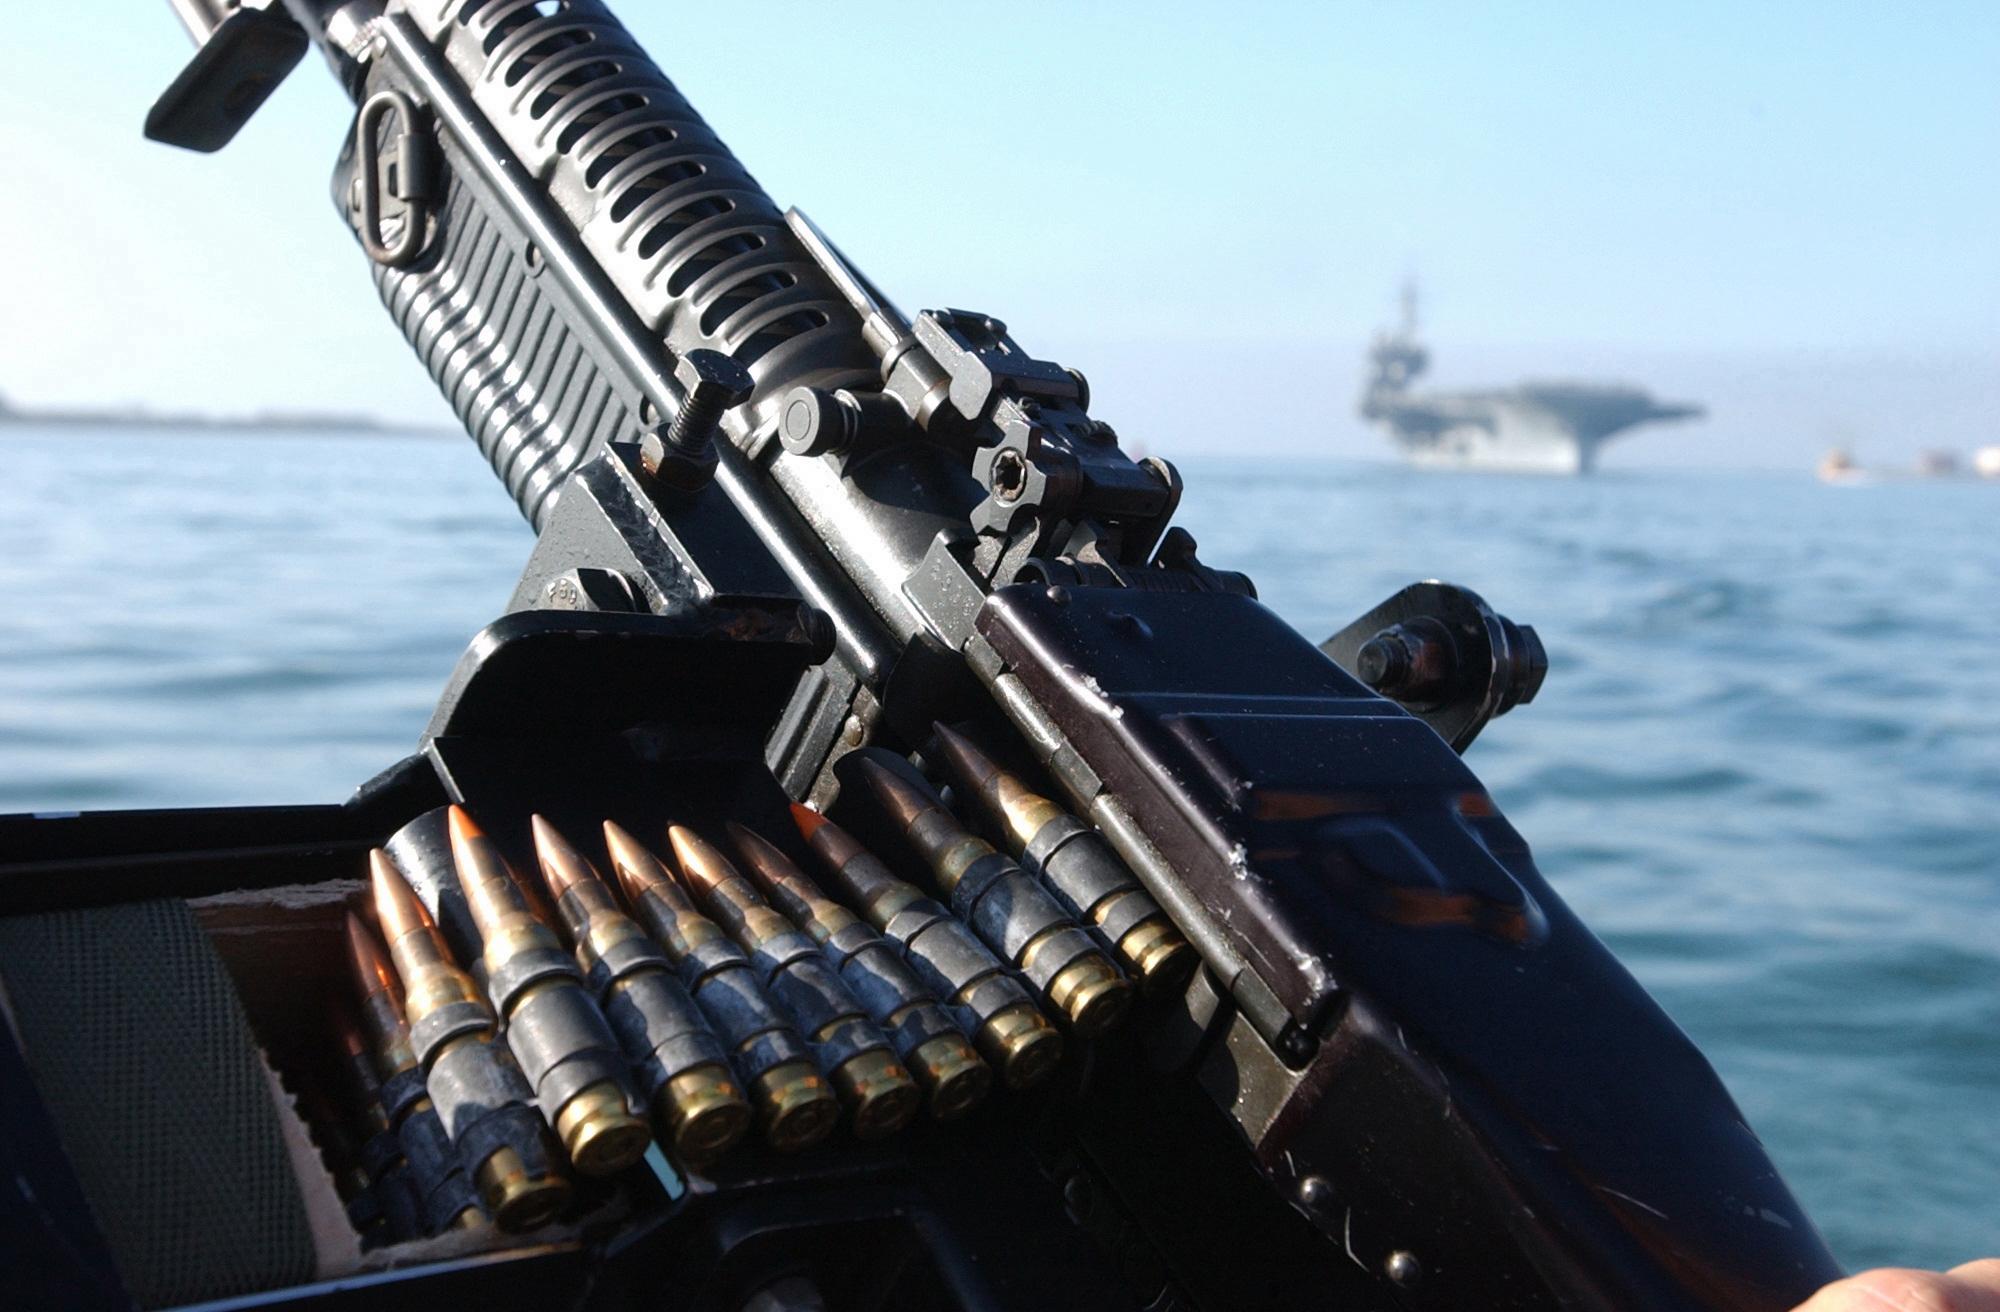 m60 machine gun - photo #37